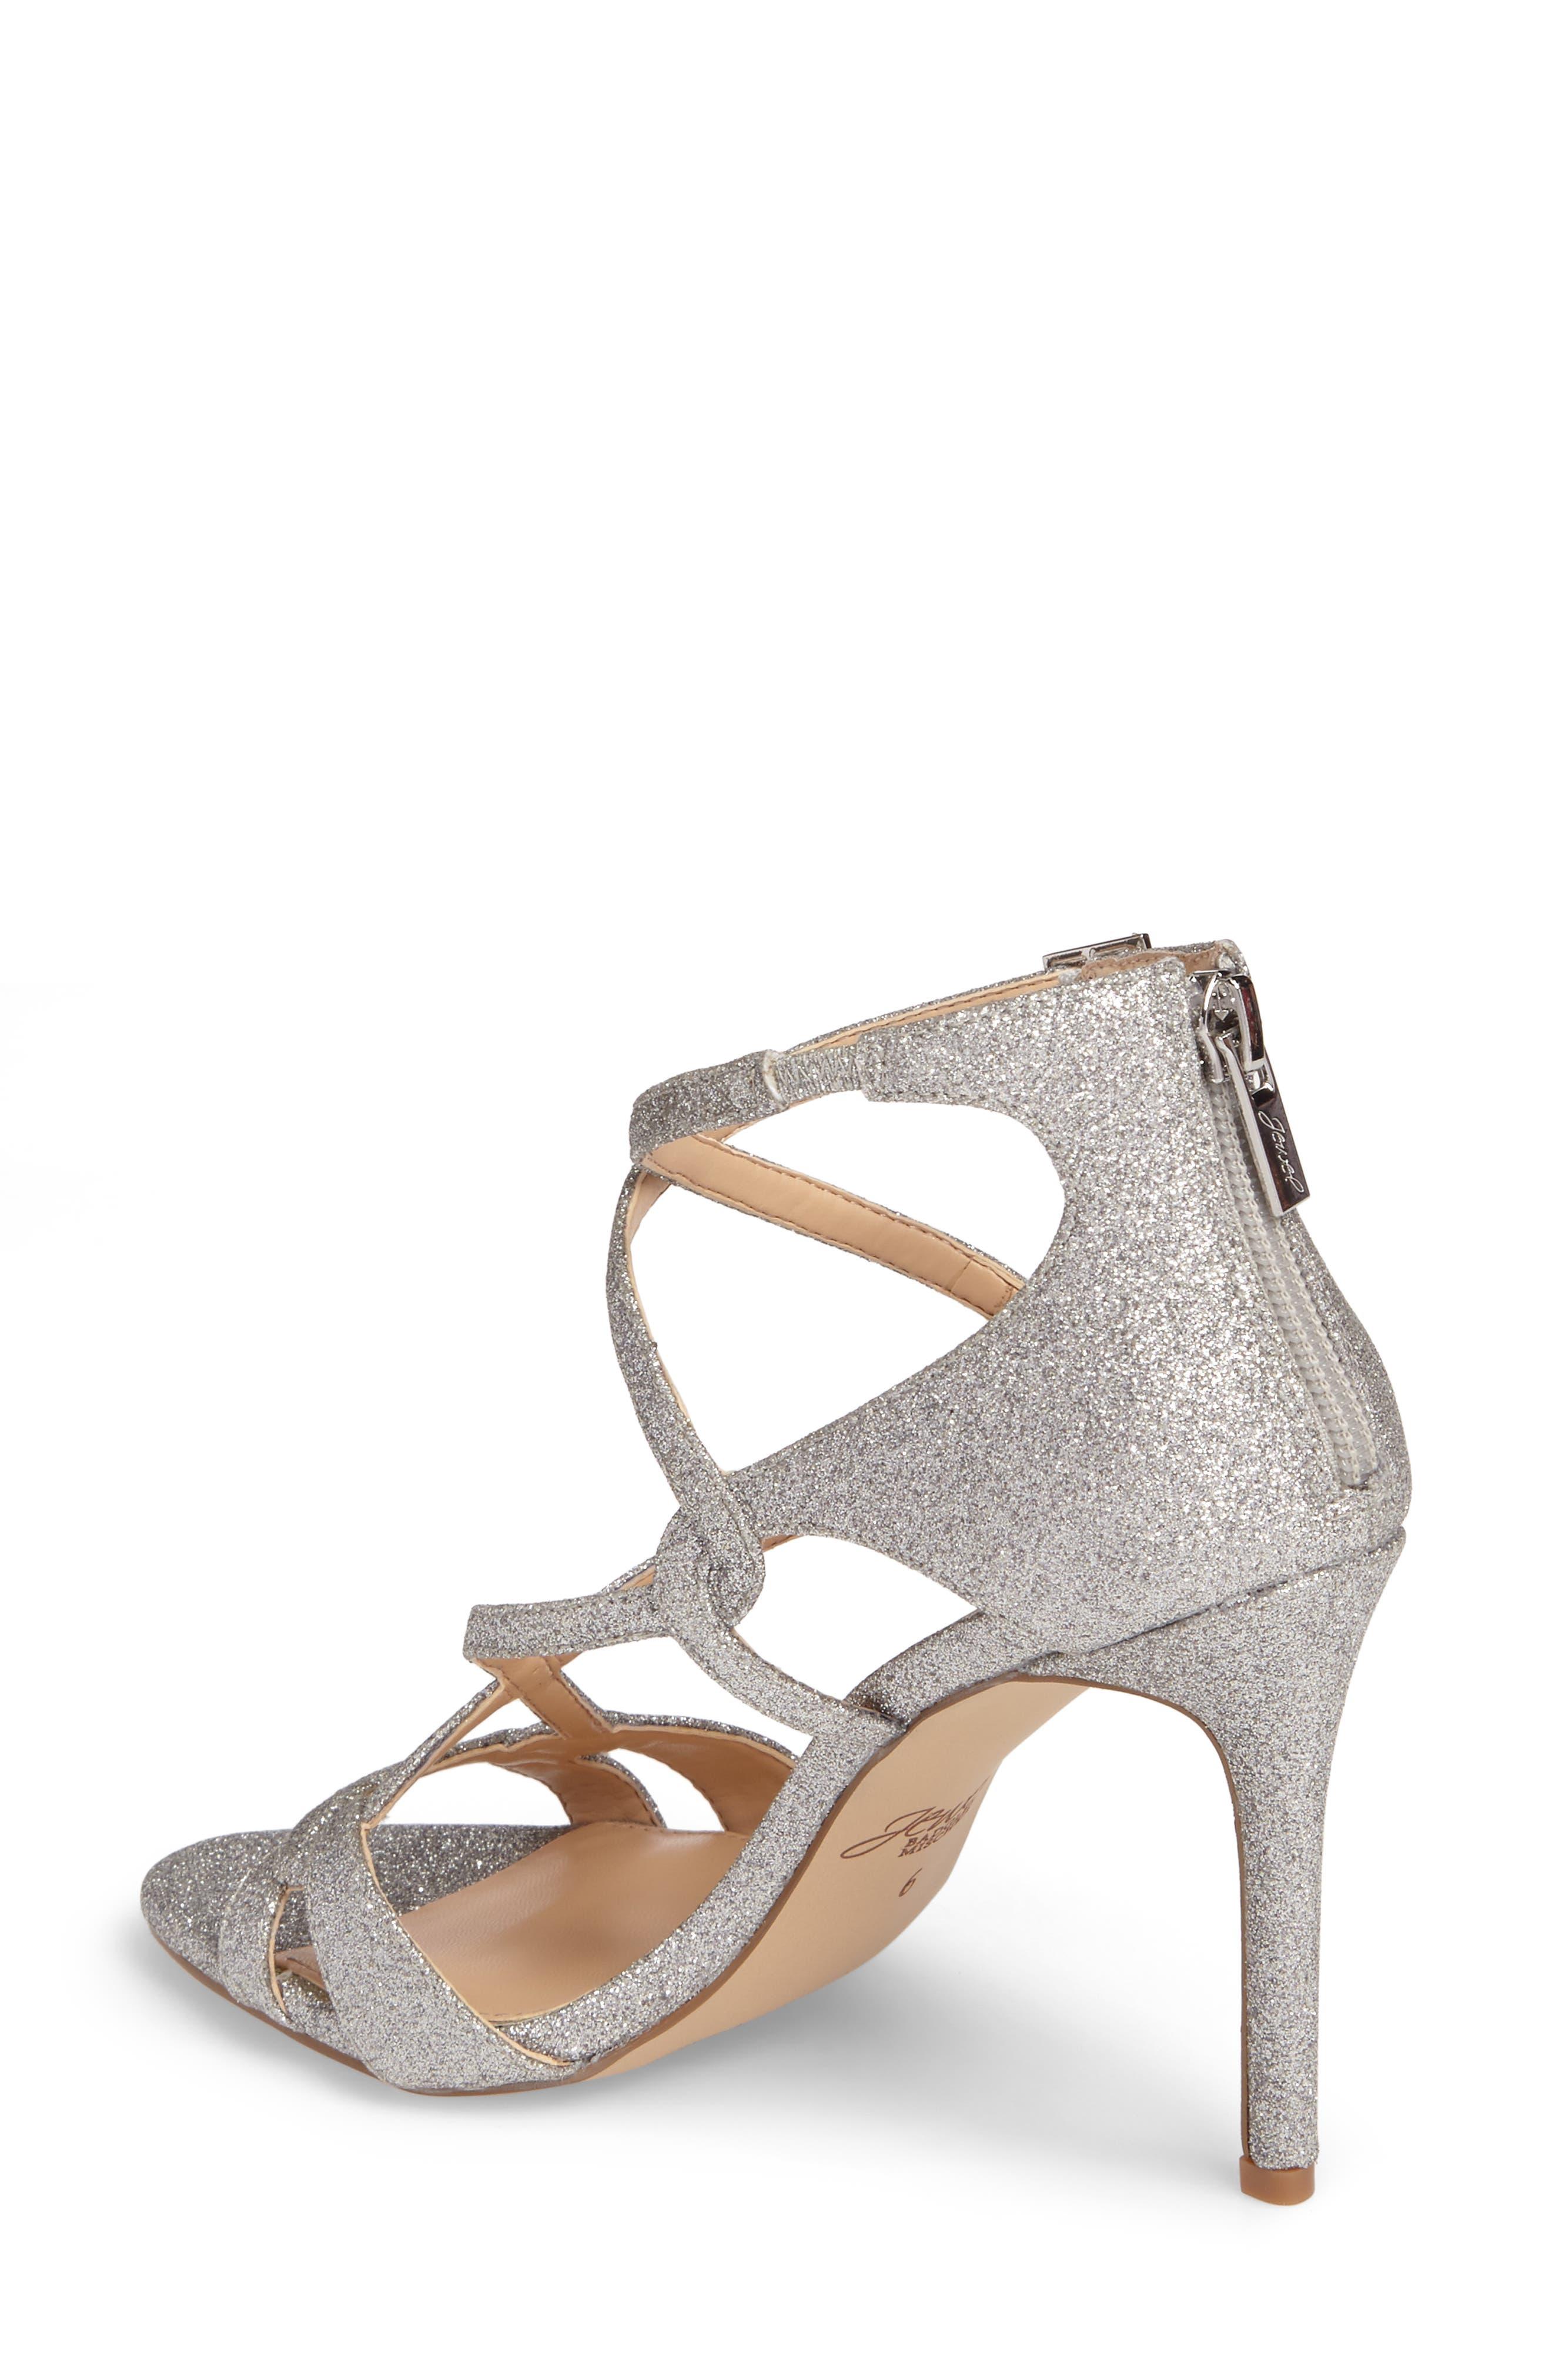 Aliza Strappy Glitter Sandal,                             Alternate thumbnail 2, color,                             043